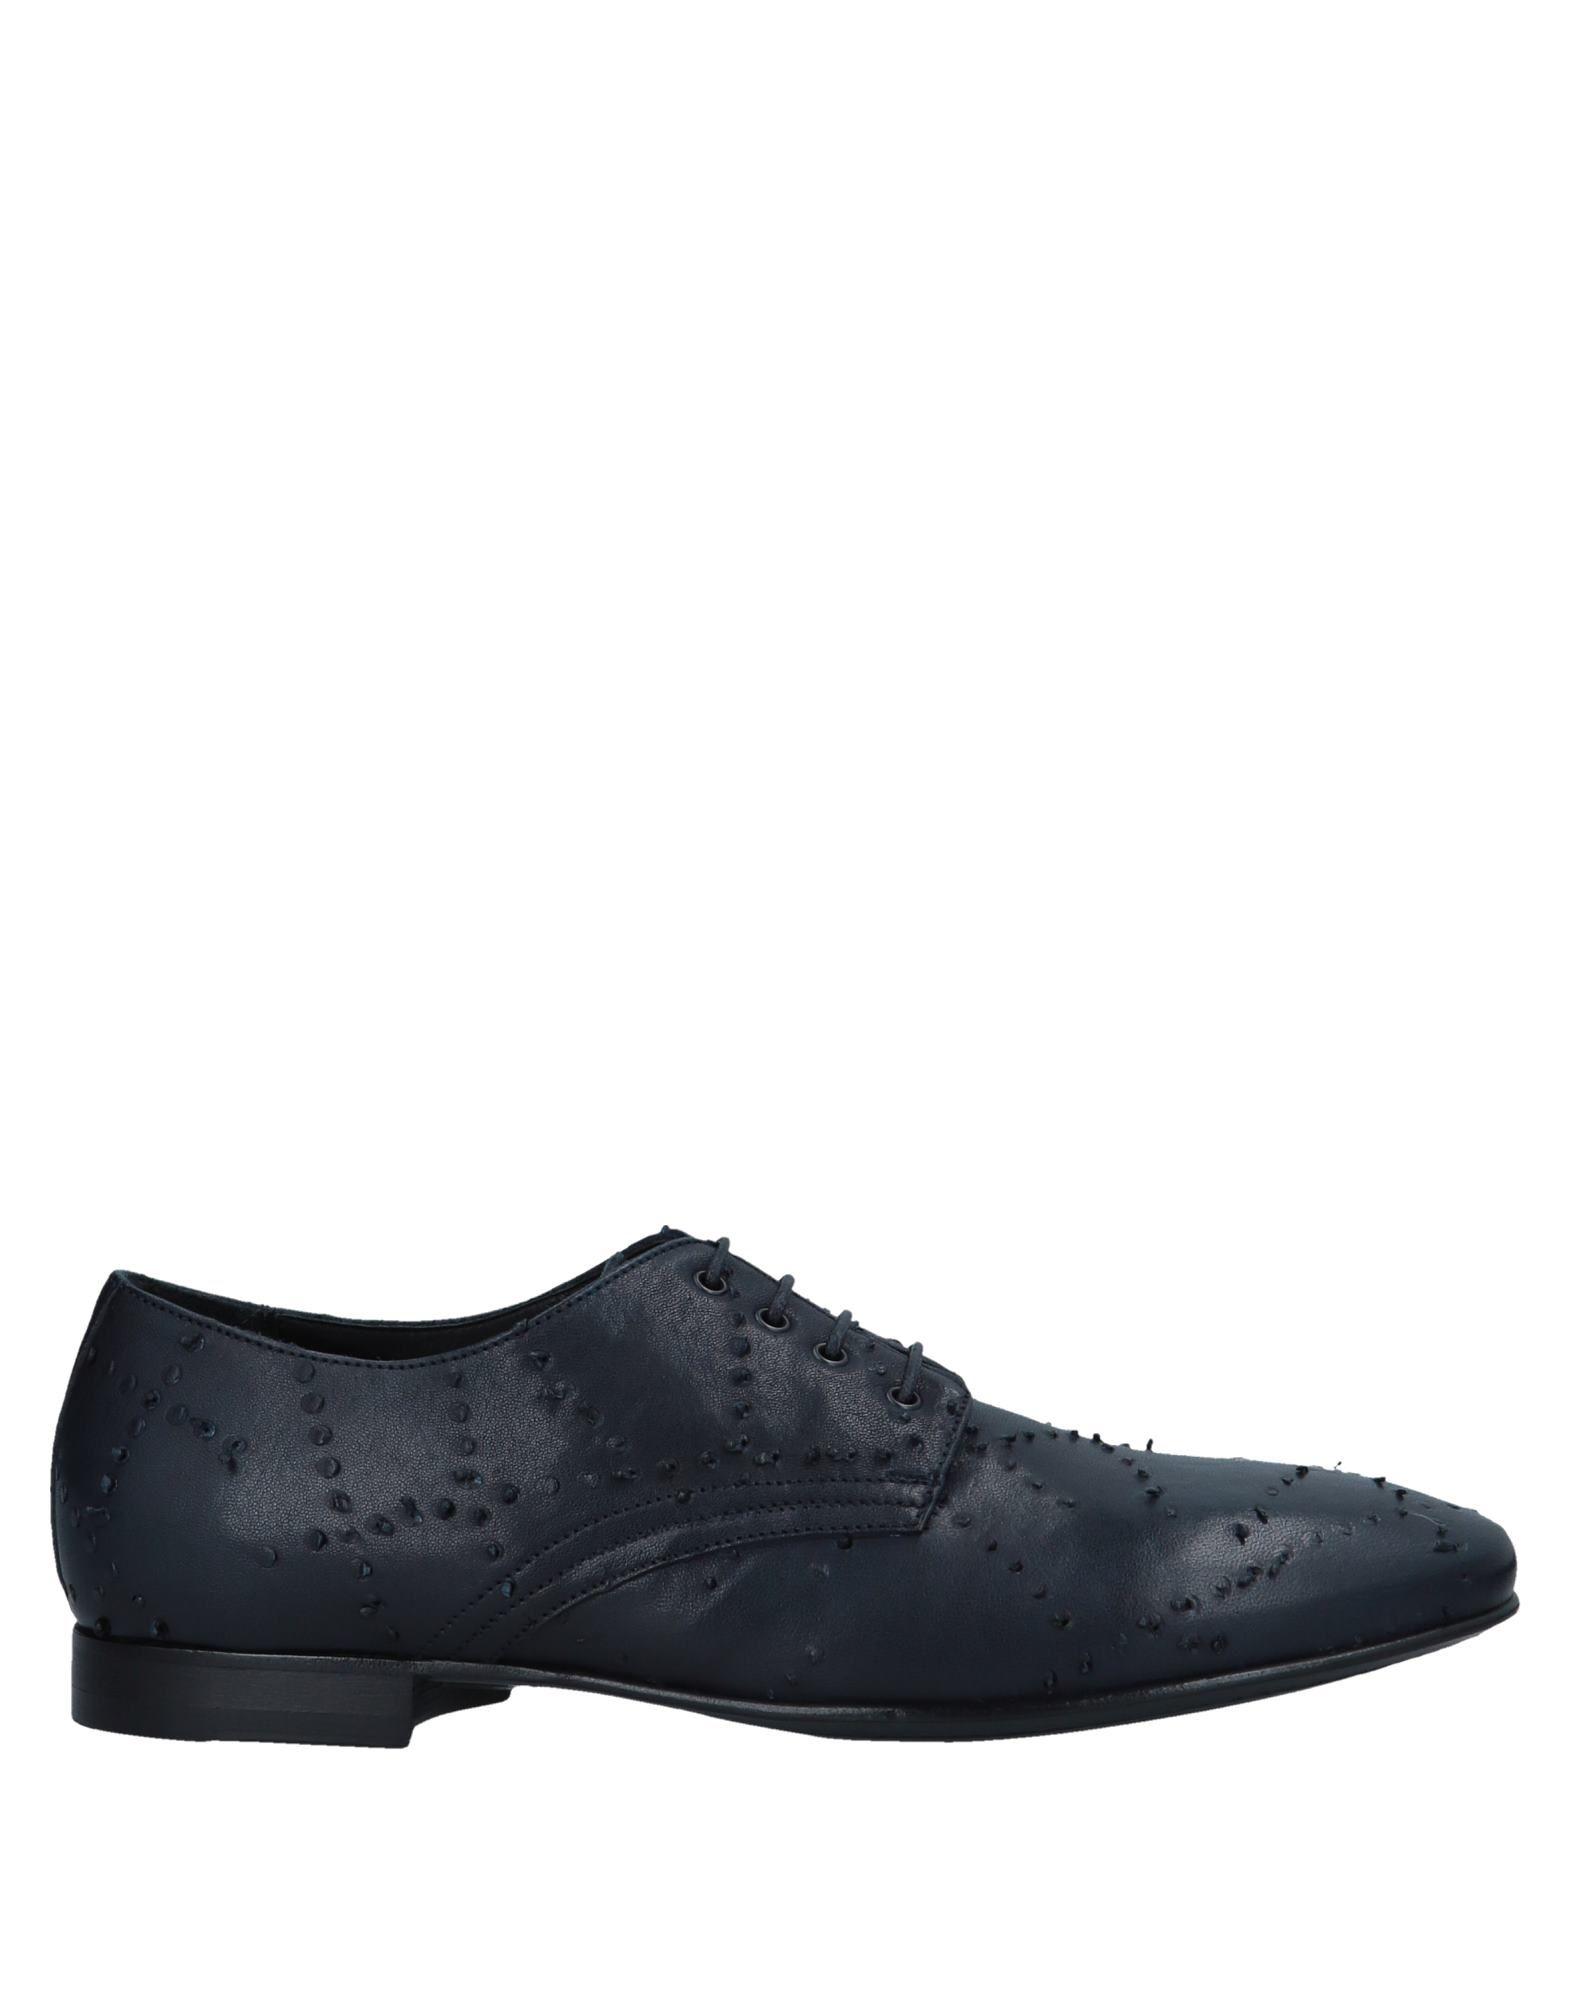 ALEXANDER HOTTO Обувь на шнурках